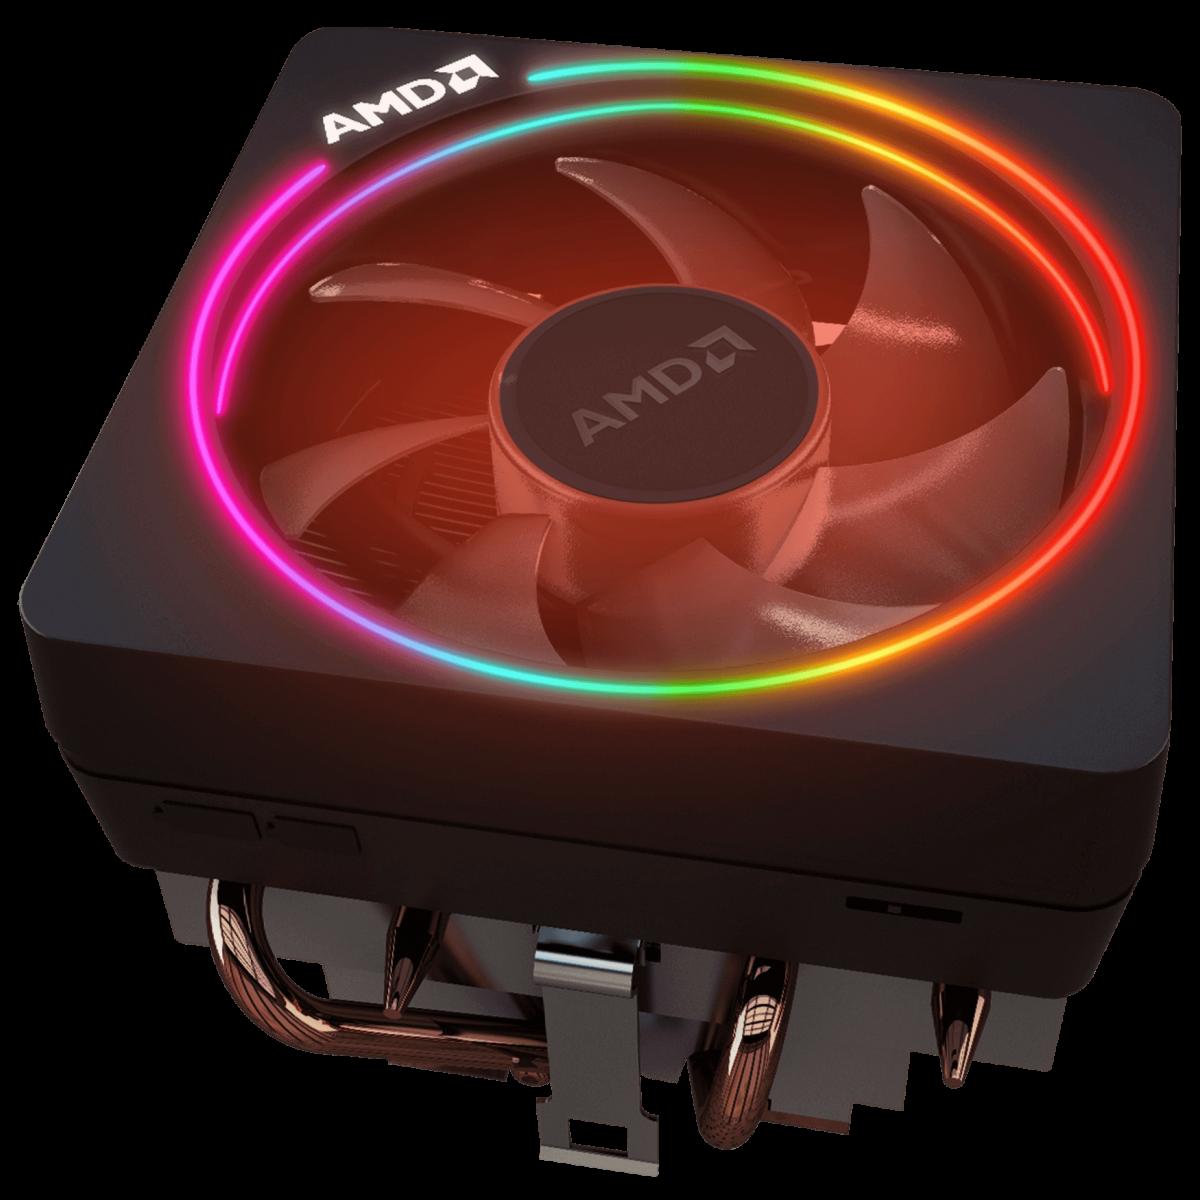 Processador AMD Ryzen 7 2700X 3.7GHz / 4.35GHz Max Turbo YD270XBGAFBOX Octa Core 16MB Cooler Wraith Prism RGB, S/ Video